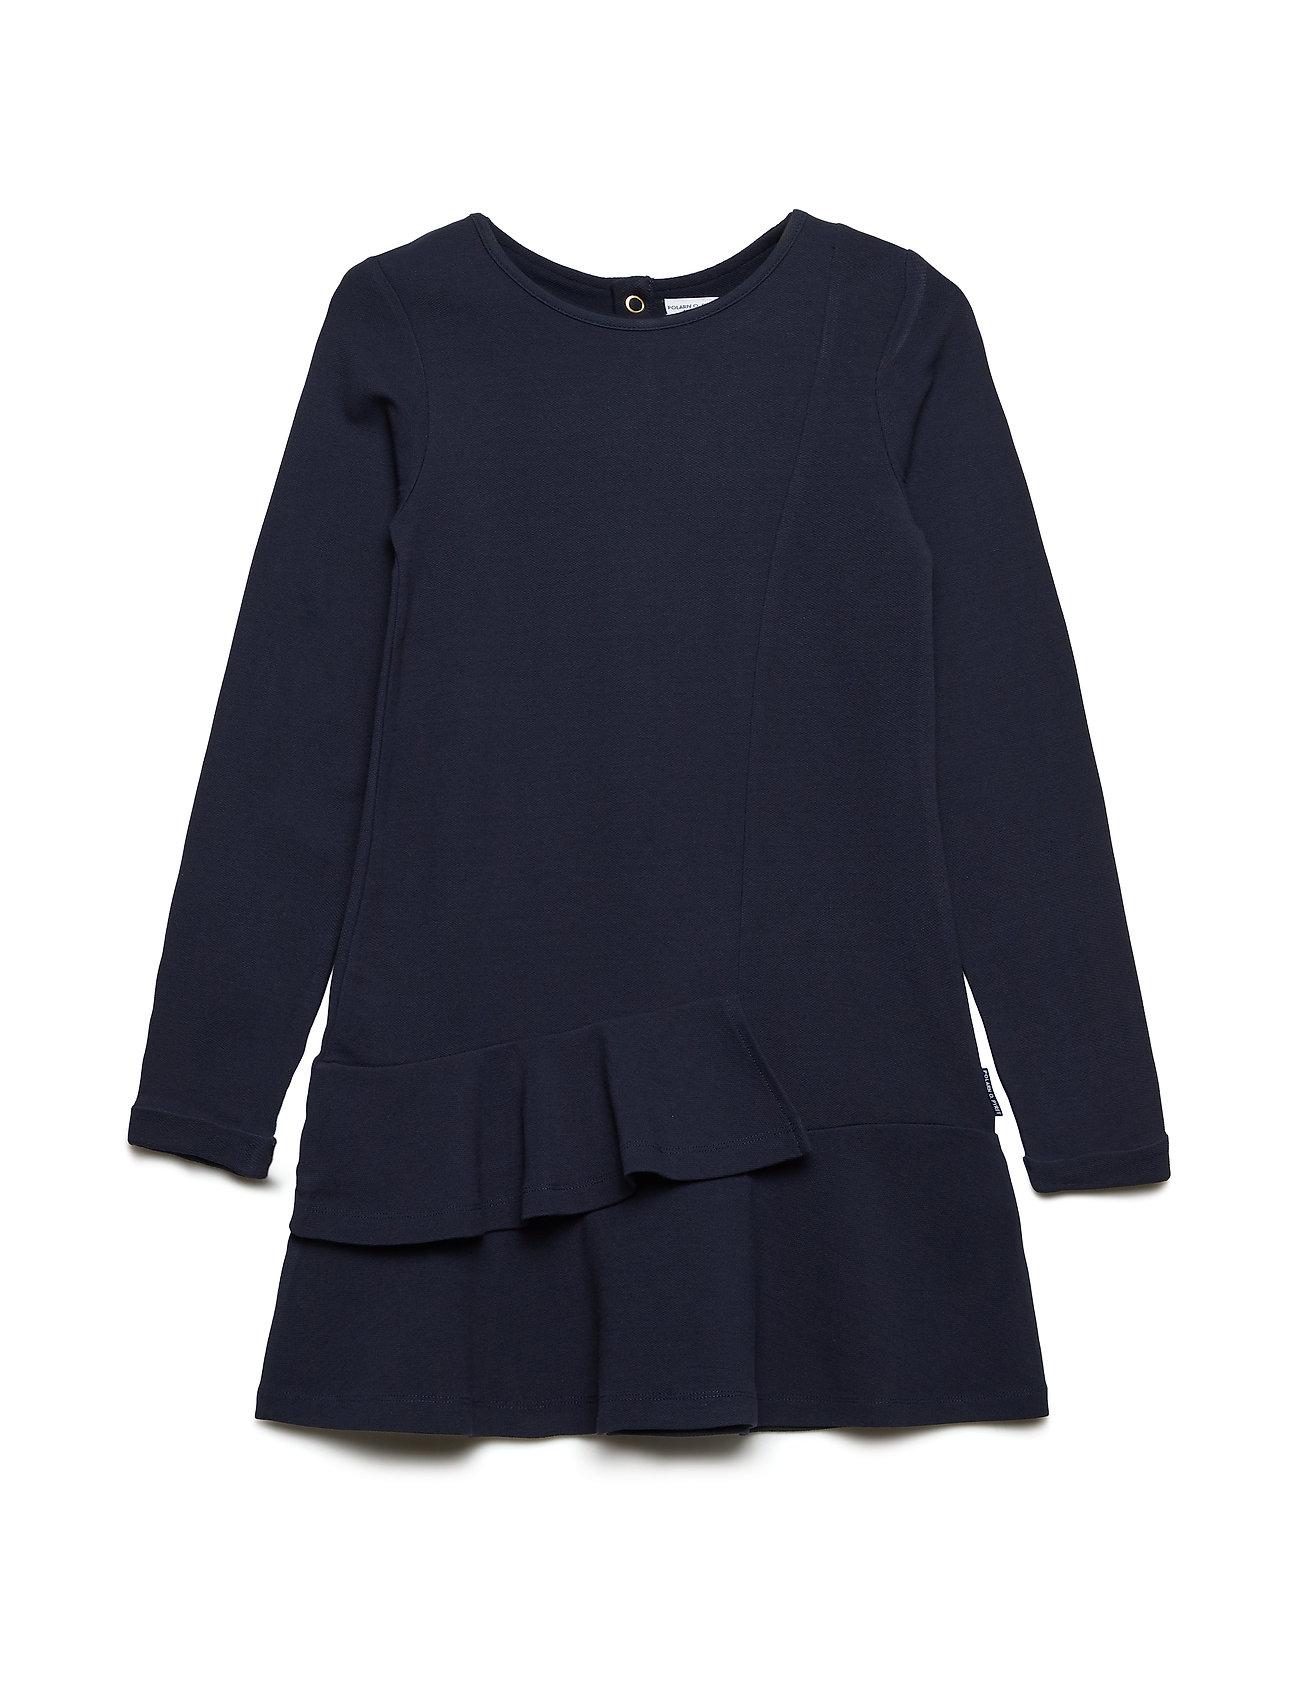 Polarn O. Pyret Dress Long Sleeve School